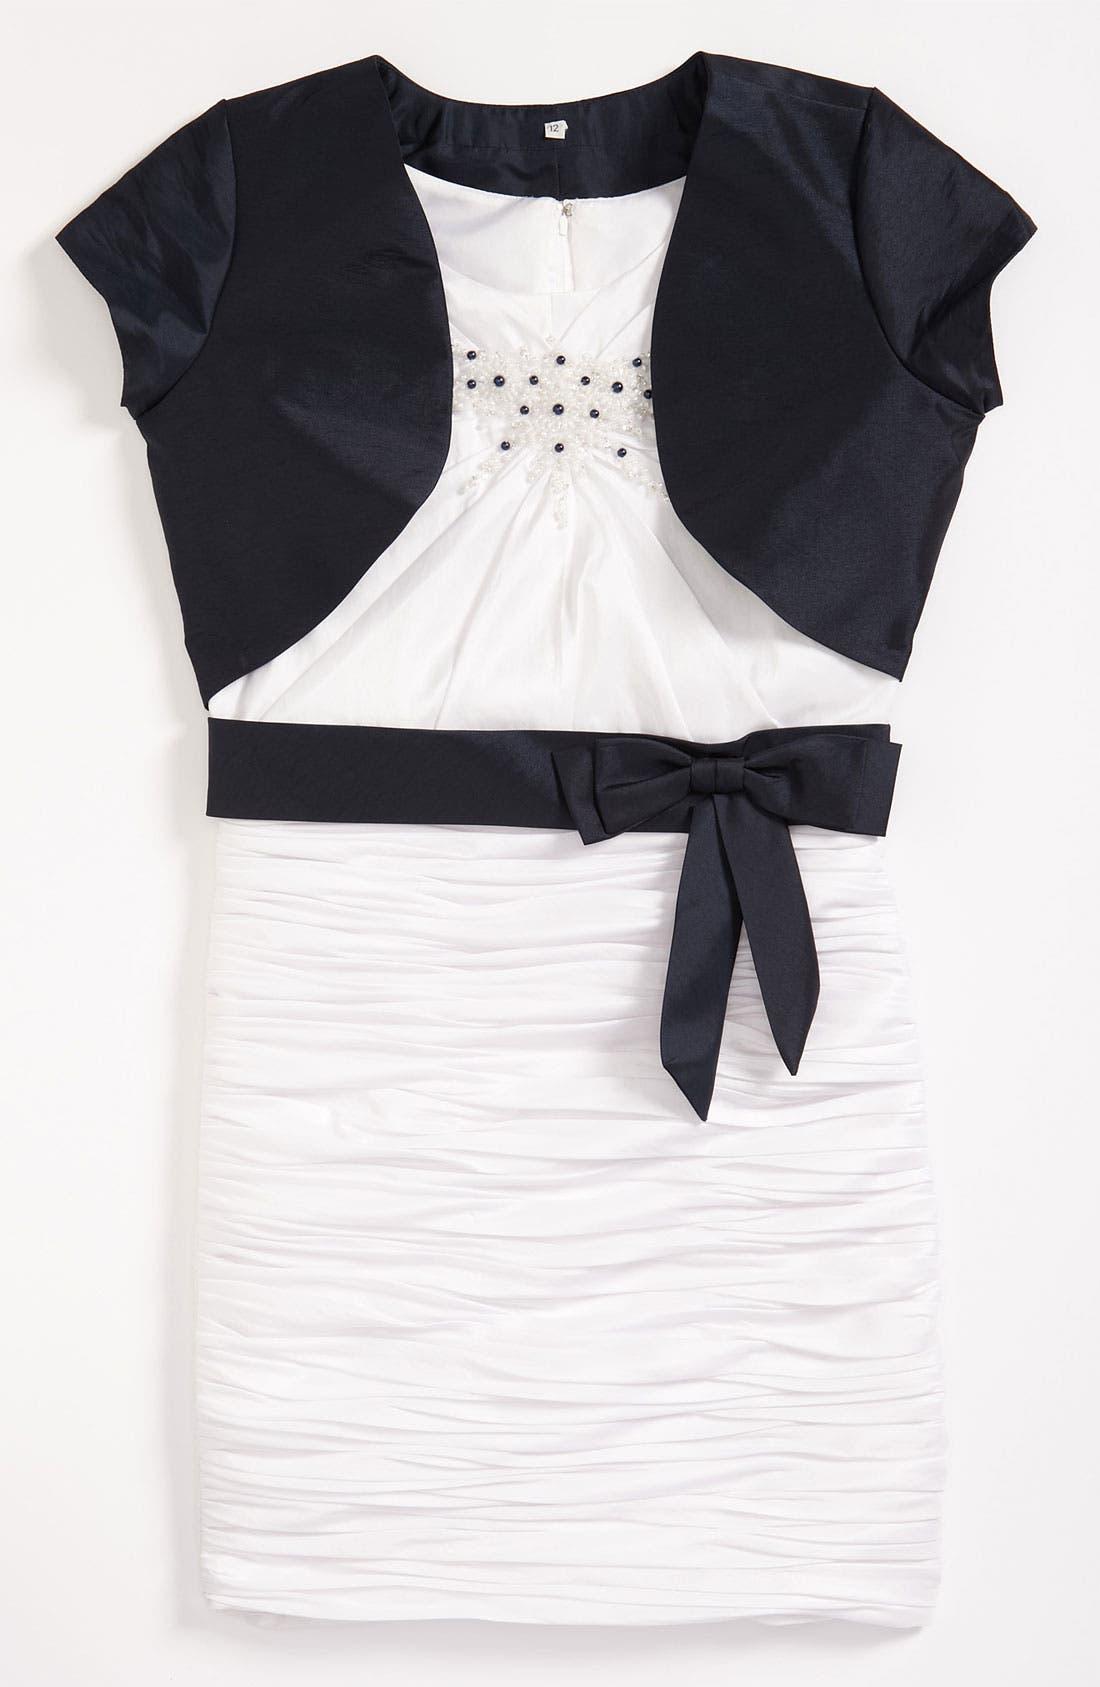 Main Image - Joan Calabrese for Mon Cheri Taffeta Dress & Bolero (Big Girls)